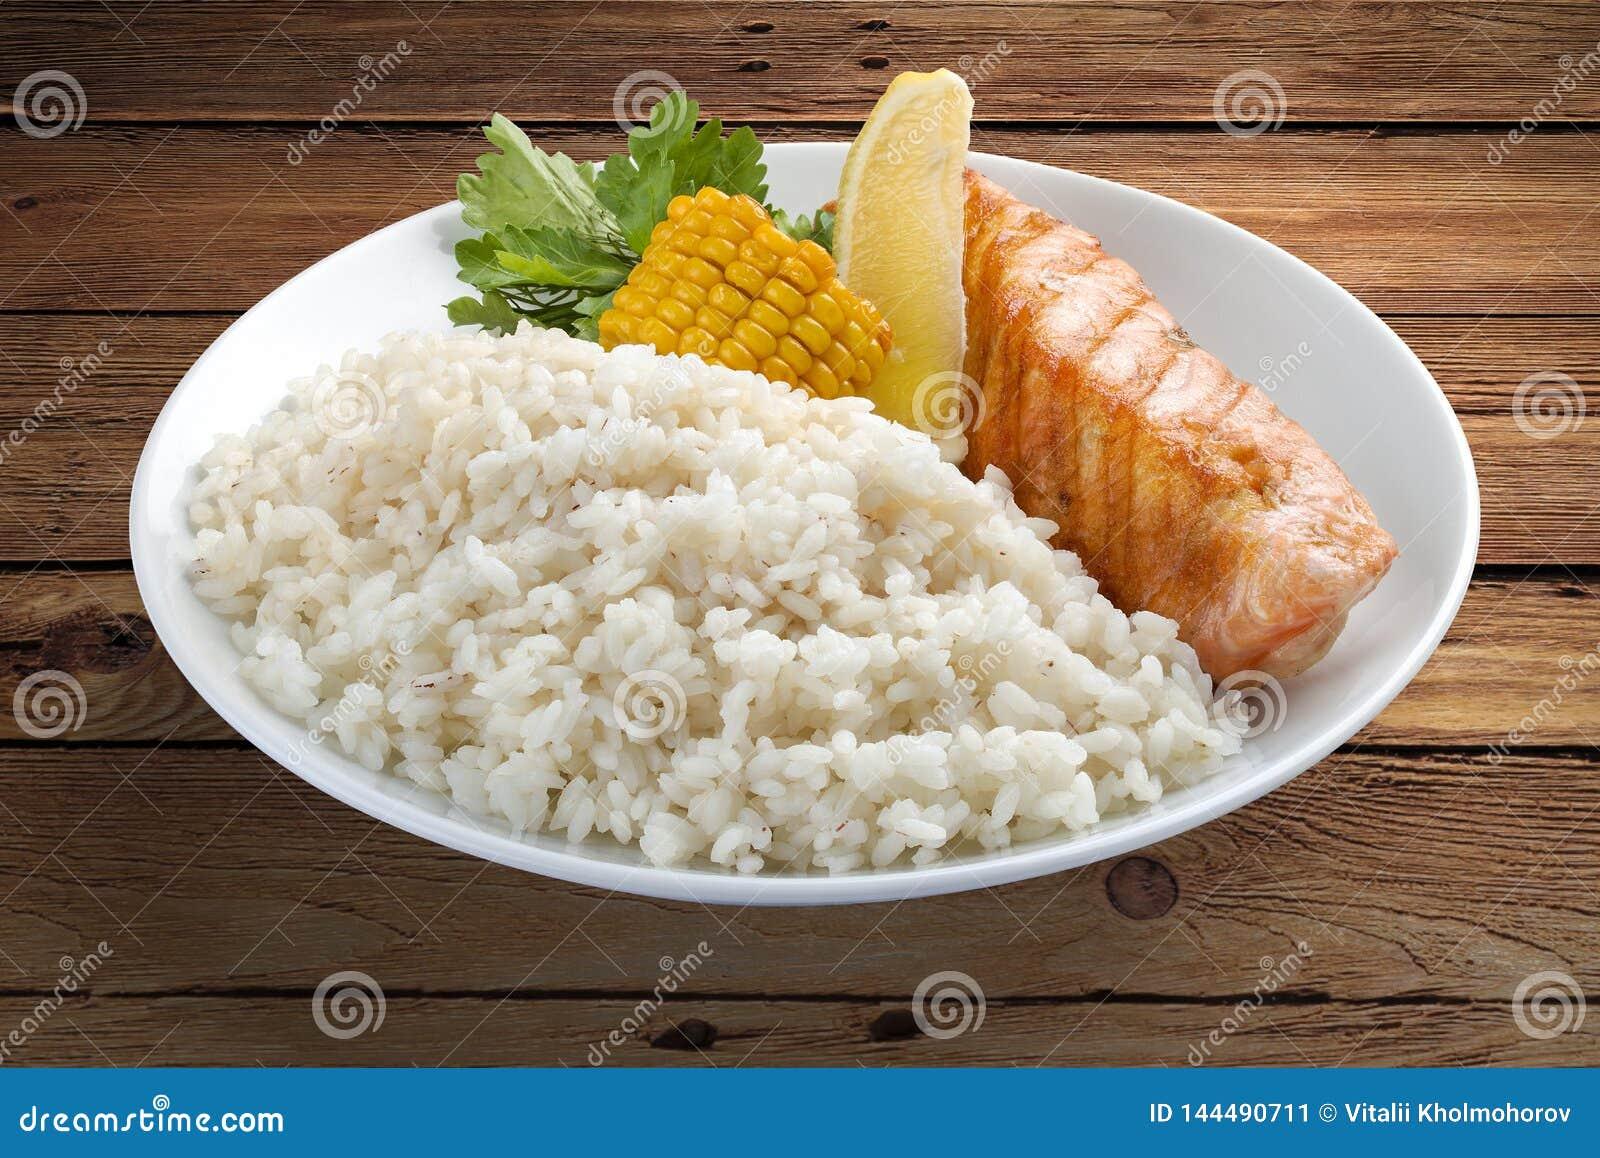 Rijsthavermoutpap met zalm en groenten